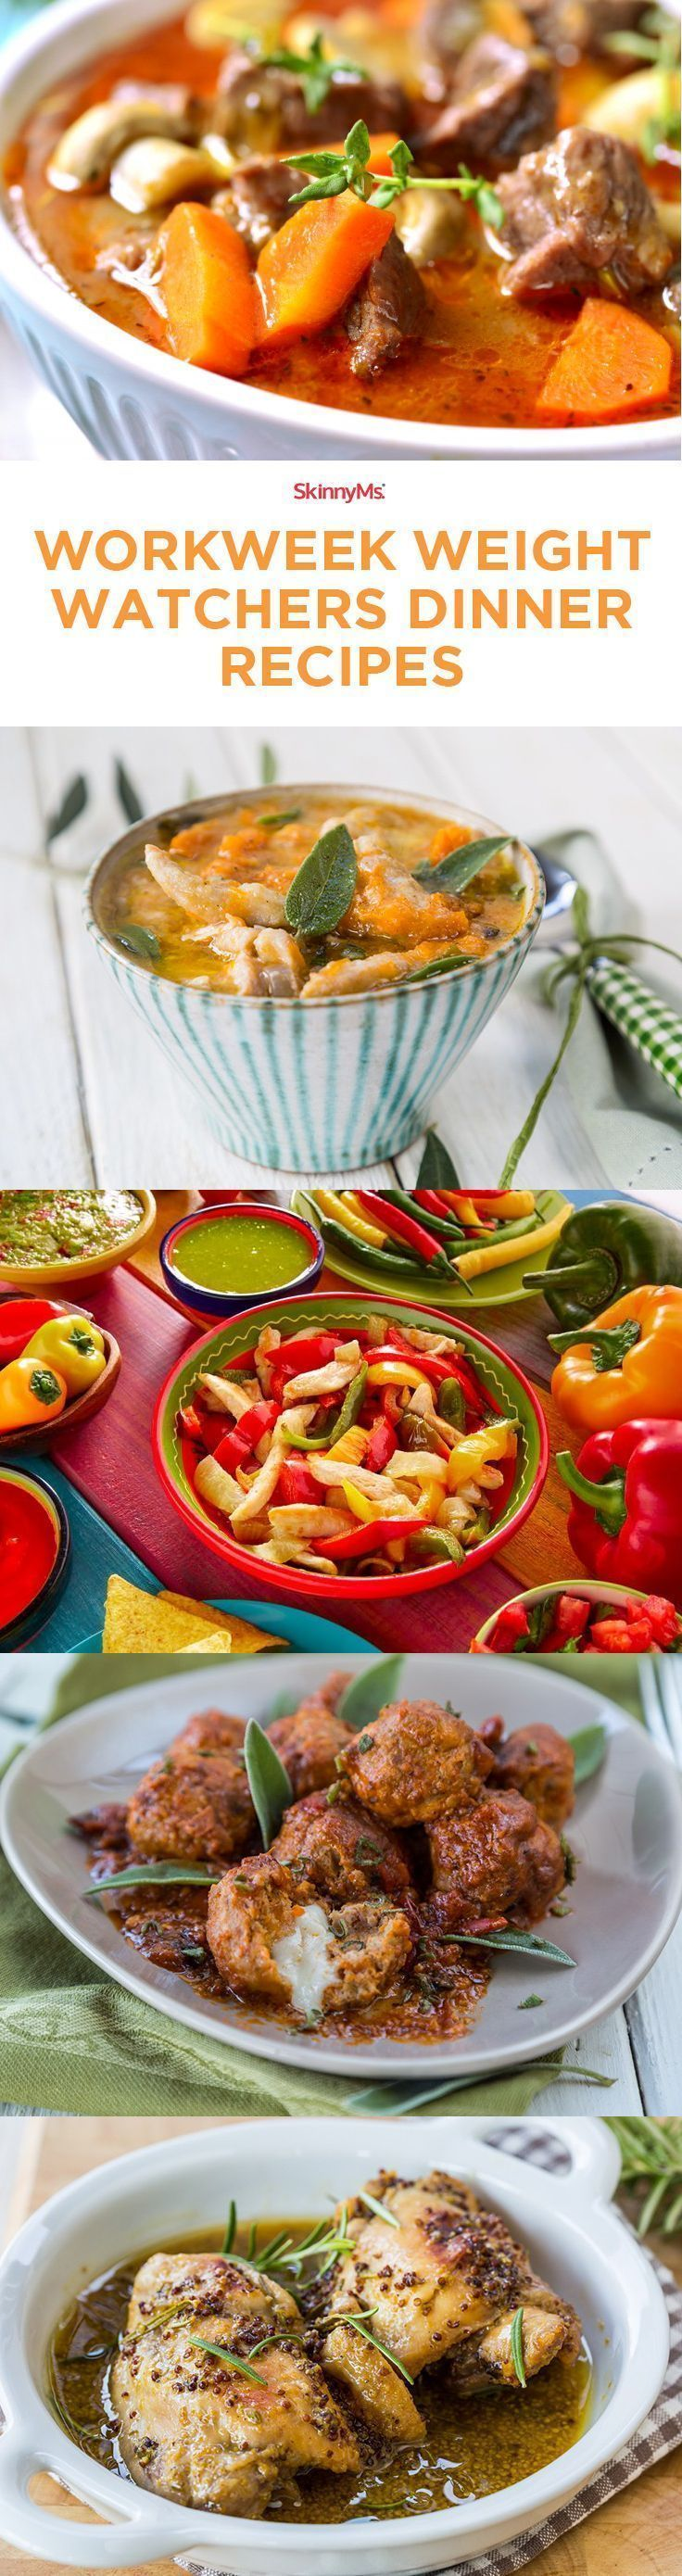 Workweek Weight Watchers Dinner Recipes